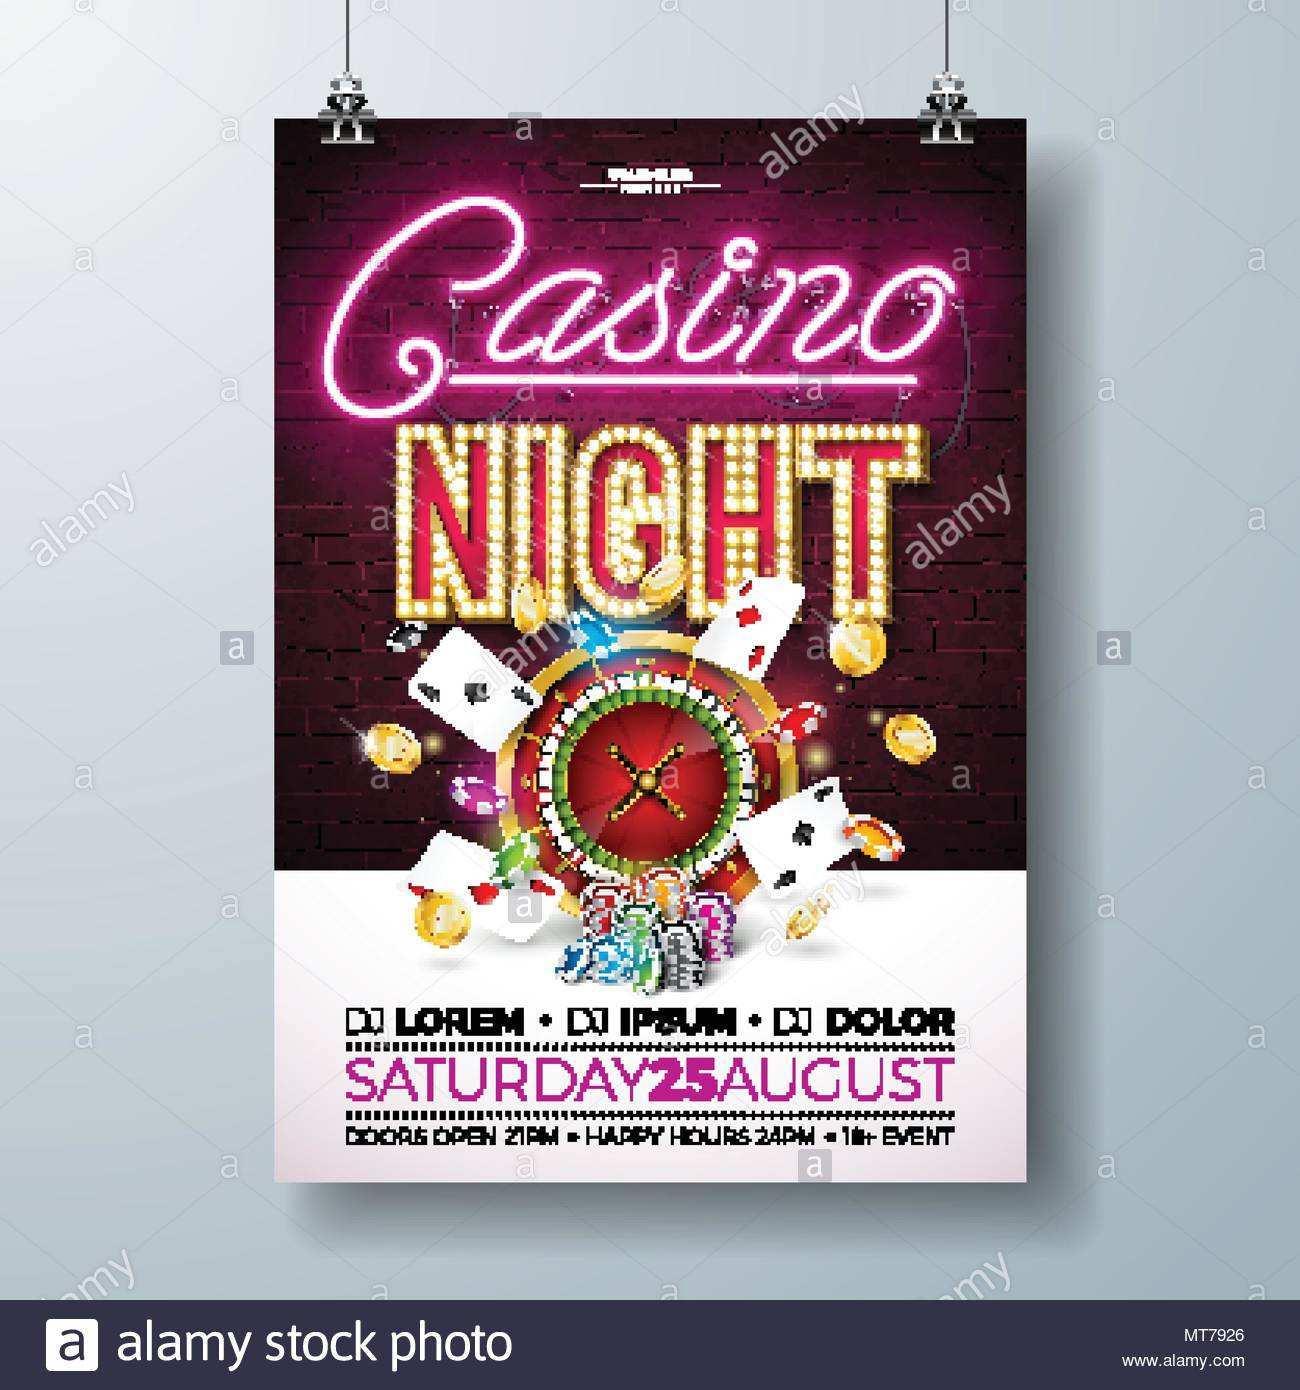 93 Visiting Casino Night Flyer Blank Template Maker for Casino Night Flyer Blank Template